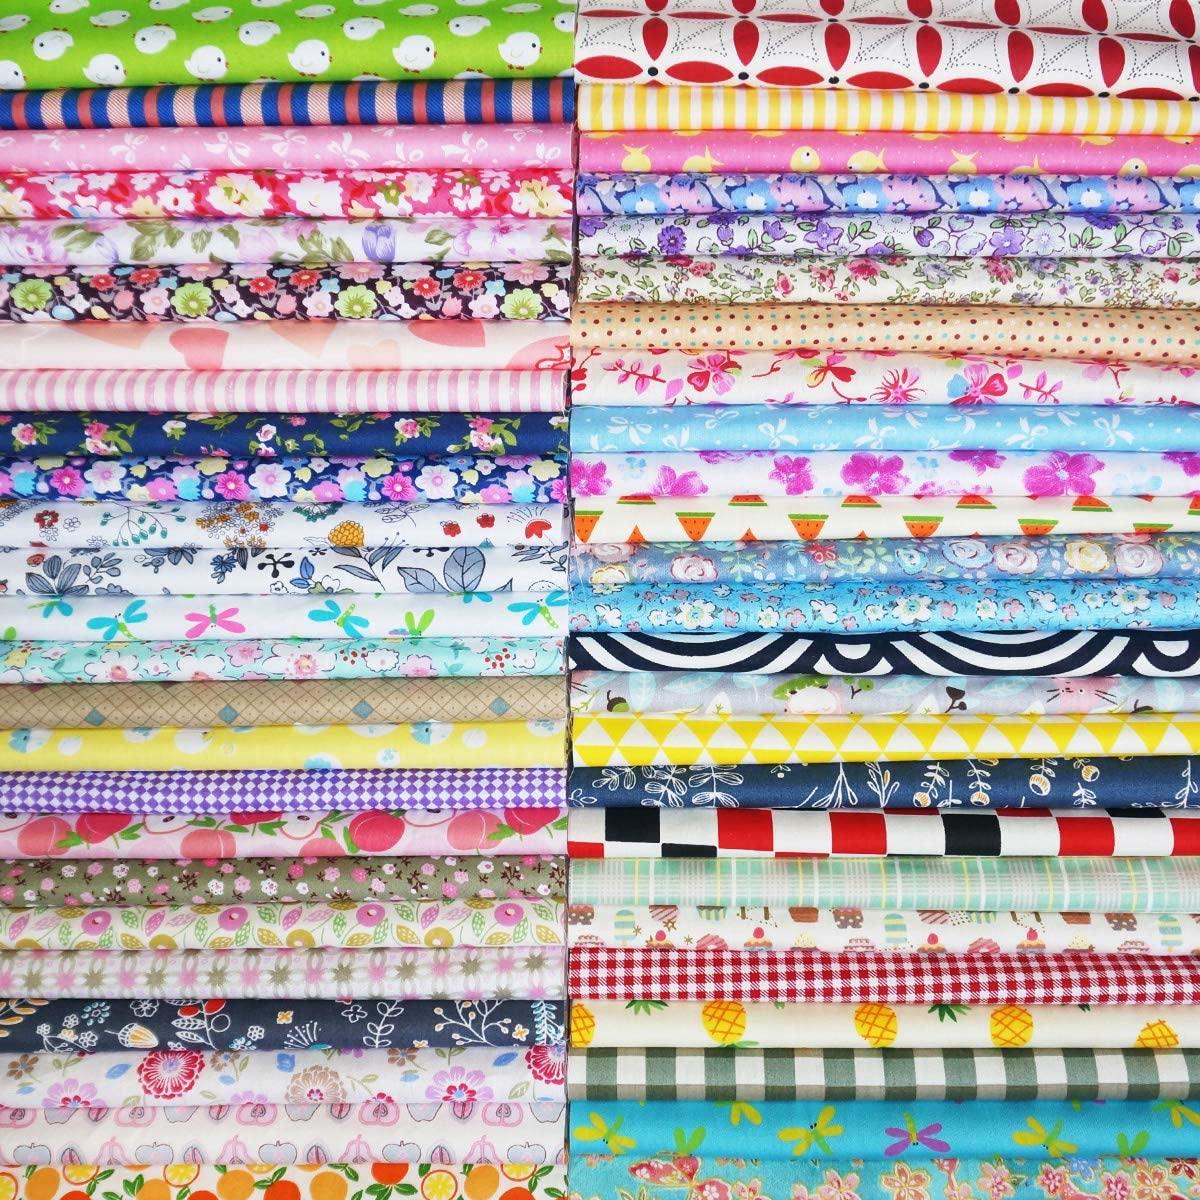 Quilting Fabric, Misscrafts 25pcs 30 x 30cm Cotton Fabric Squares Bundle Patchwork Pre-Cut Quilt Squares for DIY Sewing Scrapbooking Quilting Dot Pattern